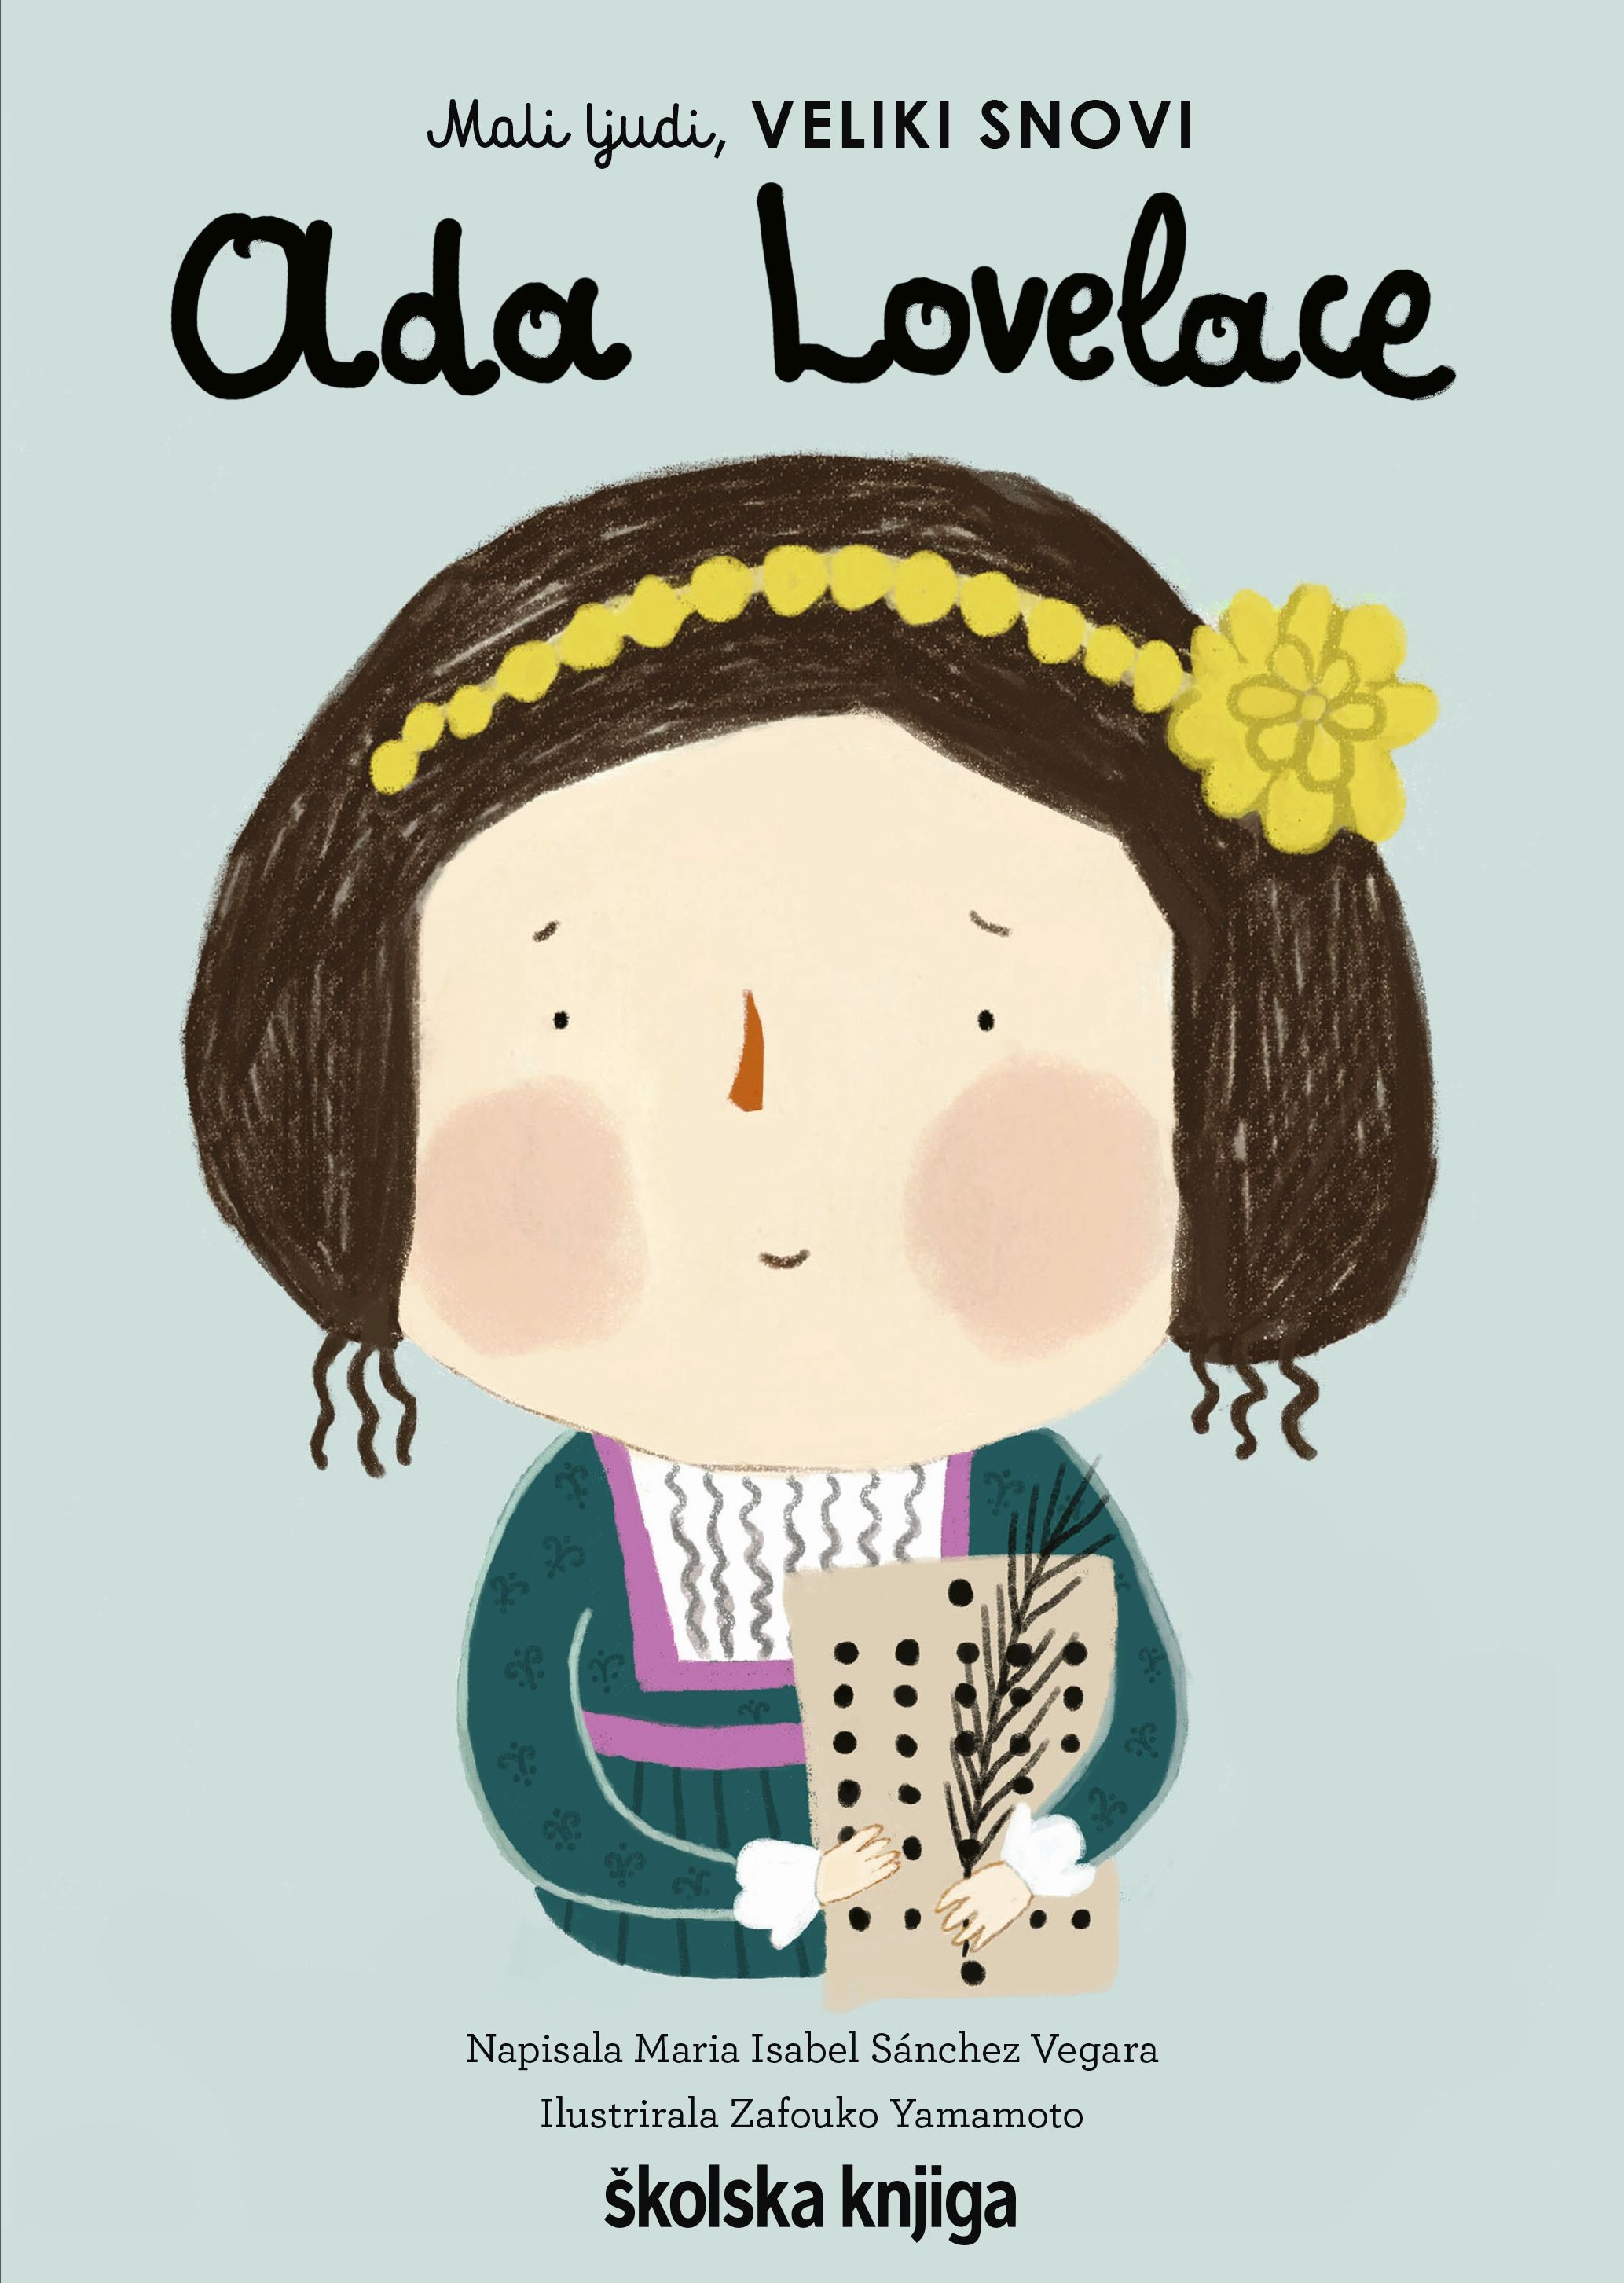 Ada Lovelace - iz serije Mali ljudi, VELIKI SNOVI